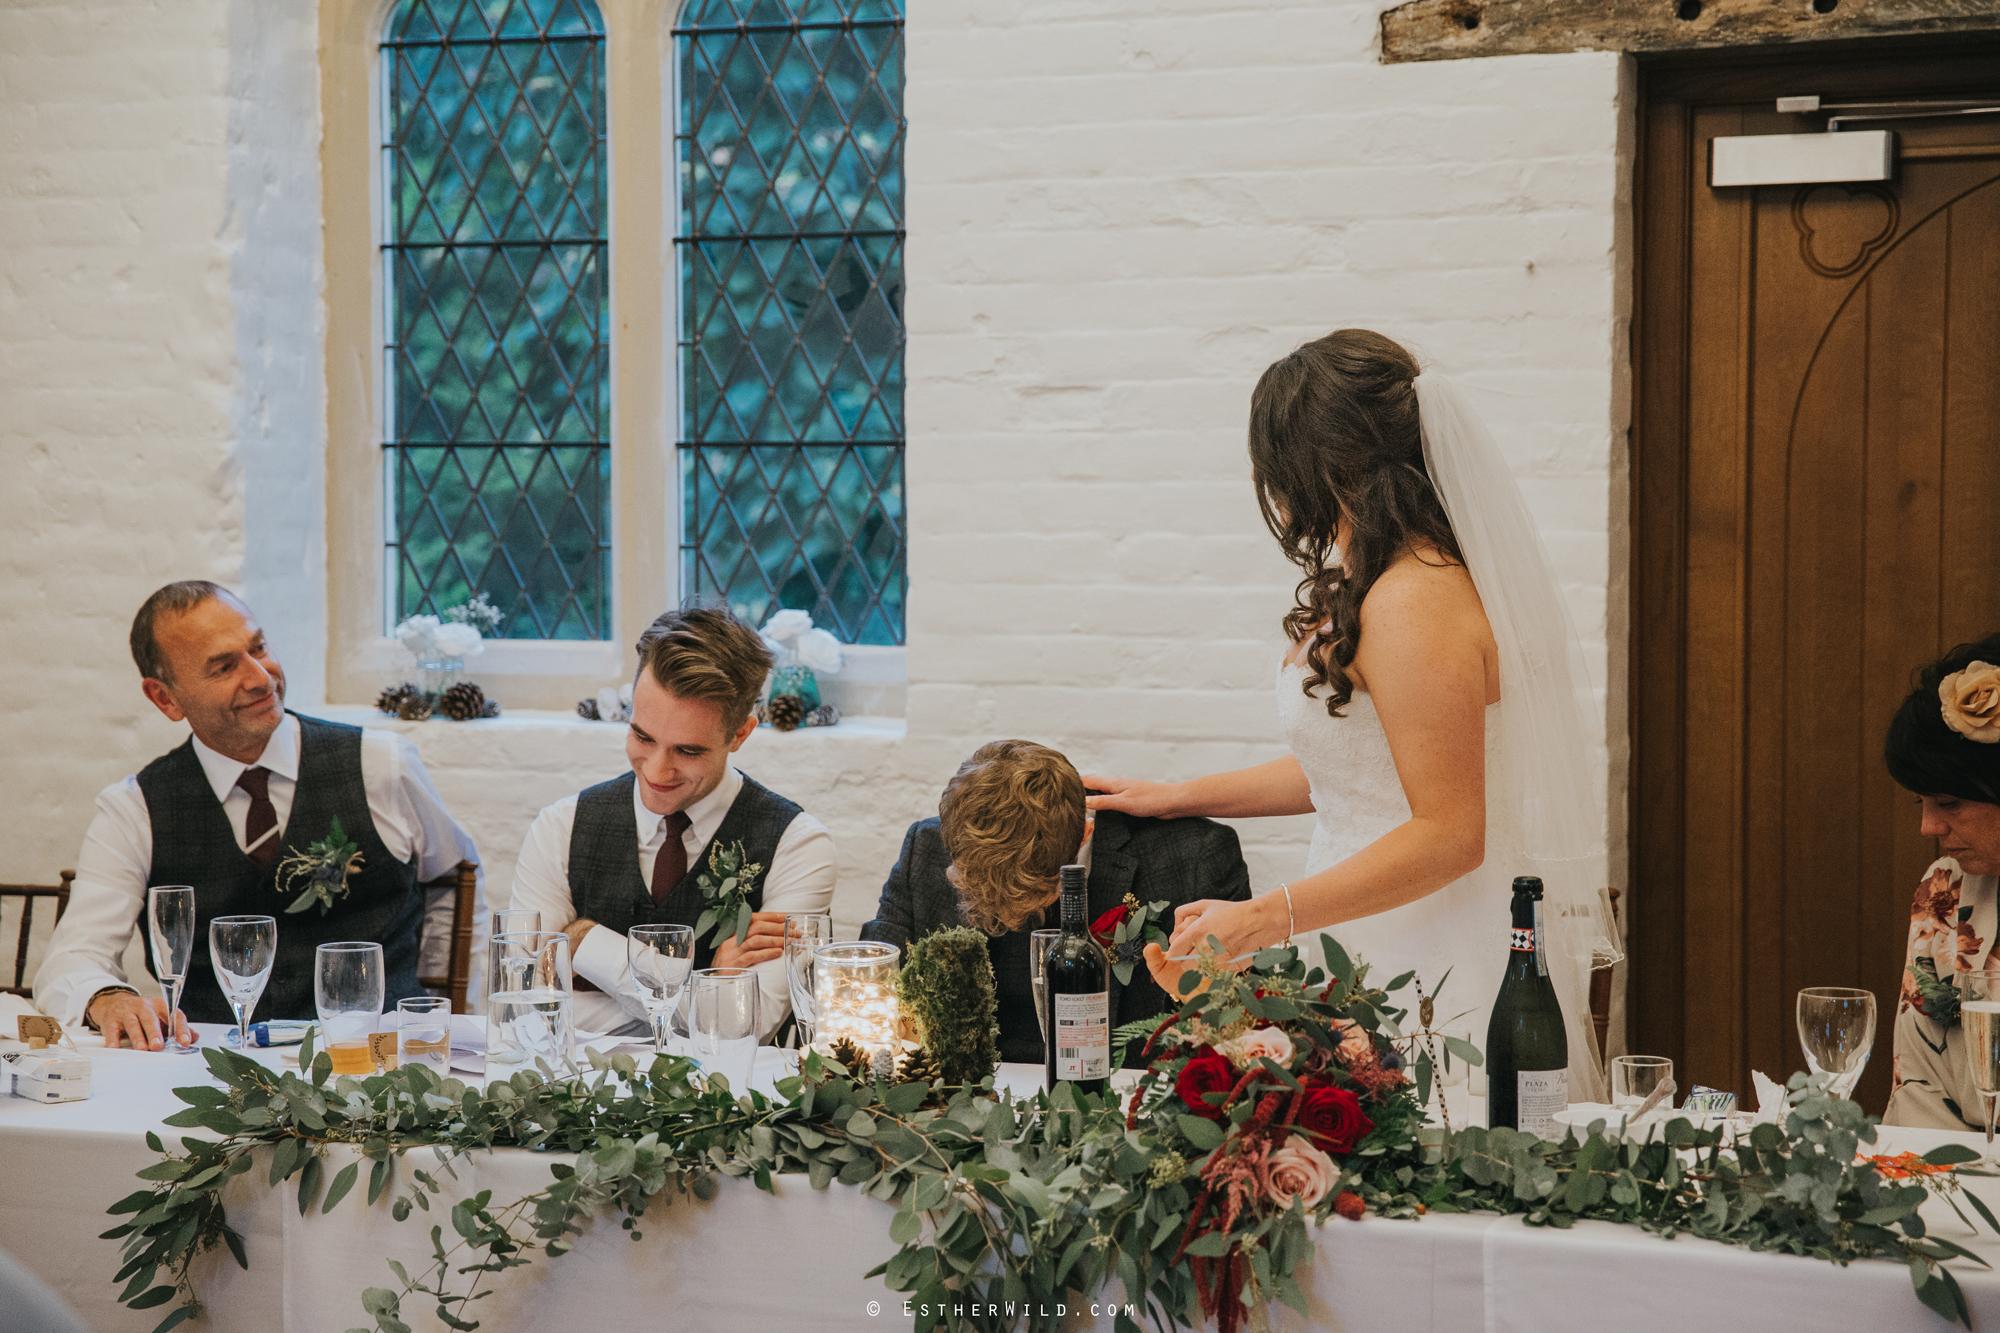 1017_Reading_Room_Weddings_Alby_Norwich_Photographer_Esther_Wild_IMG_2460.jpg